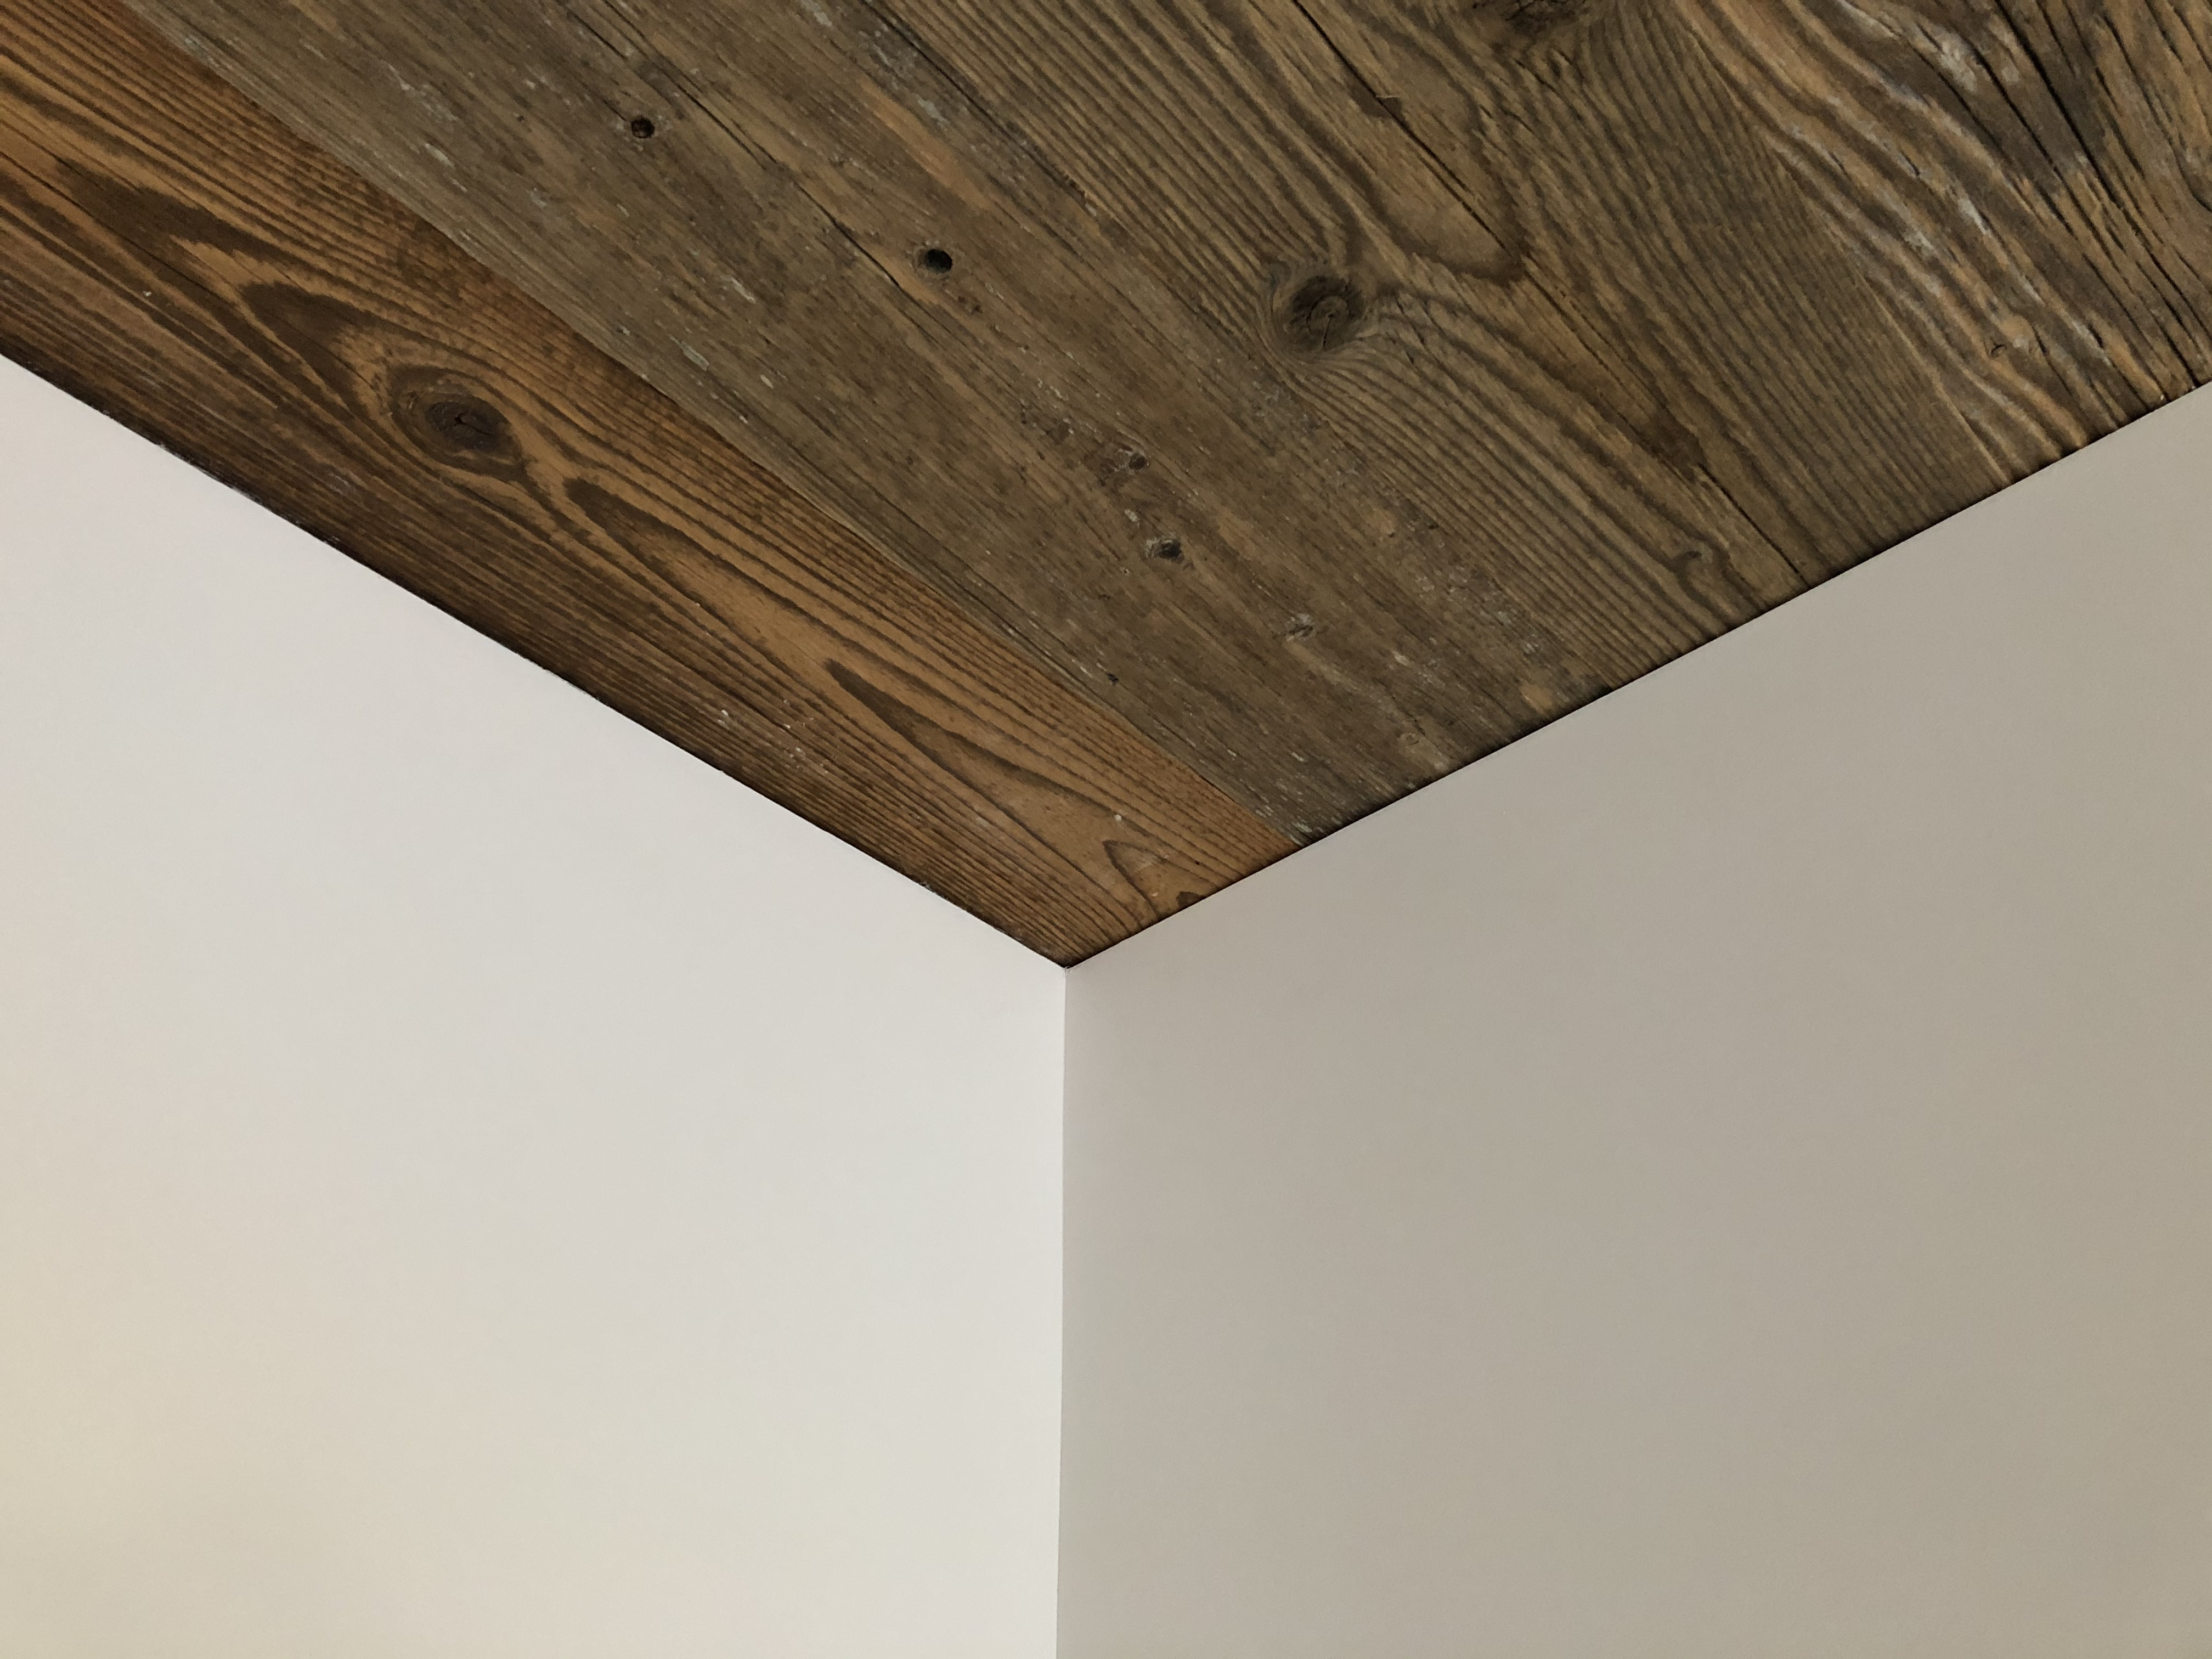 shadow gap - walls vs ceiling (in the corner)